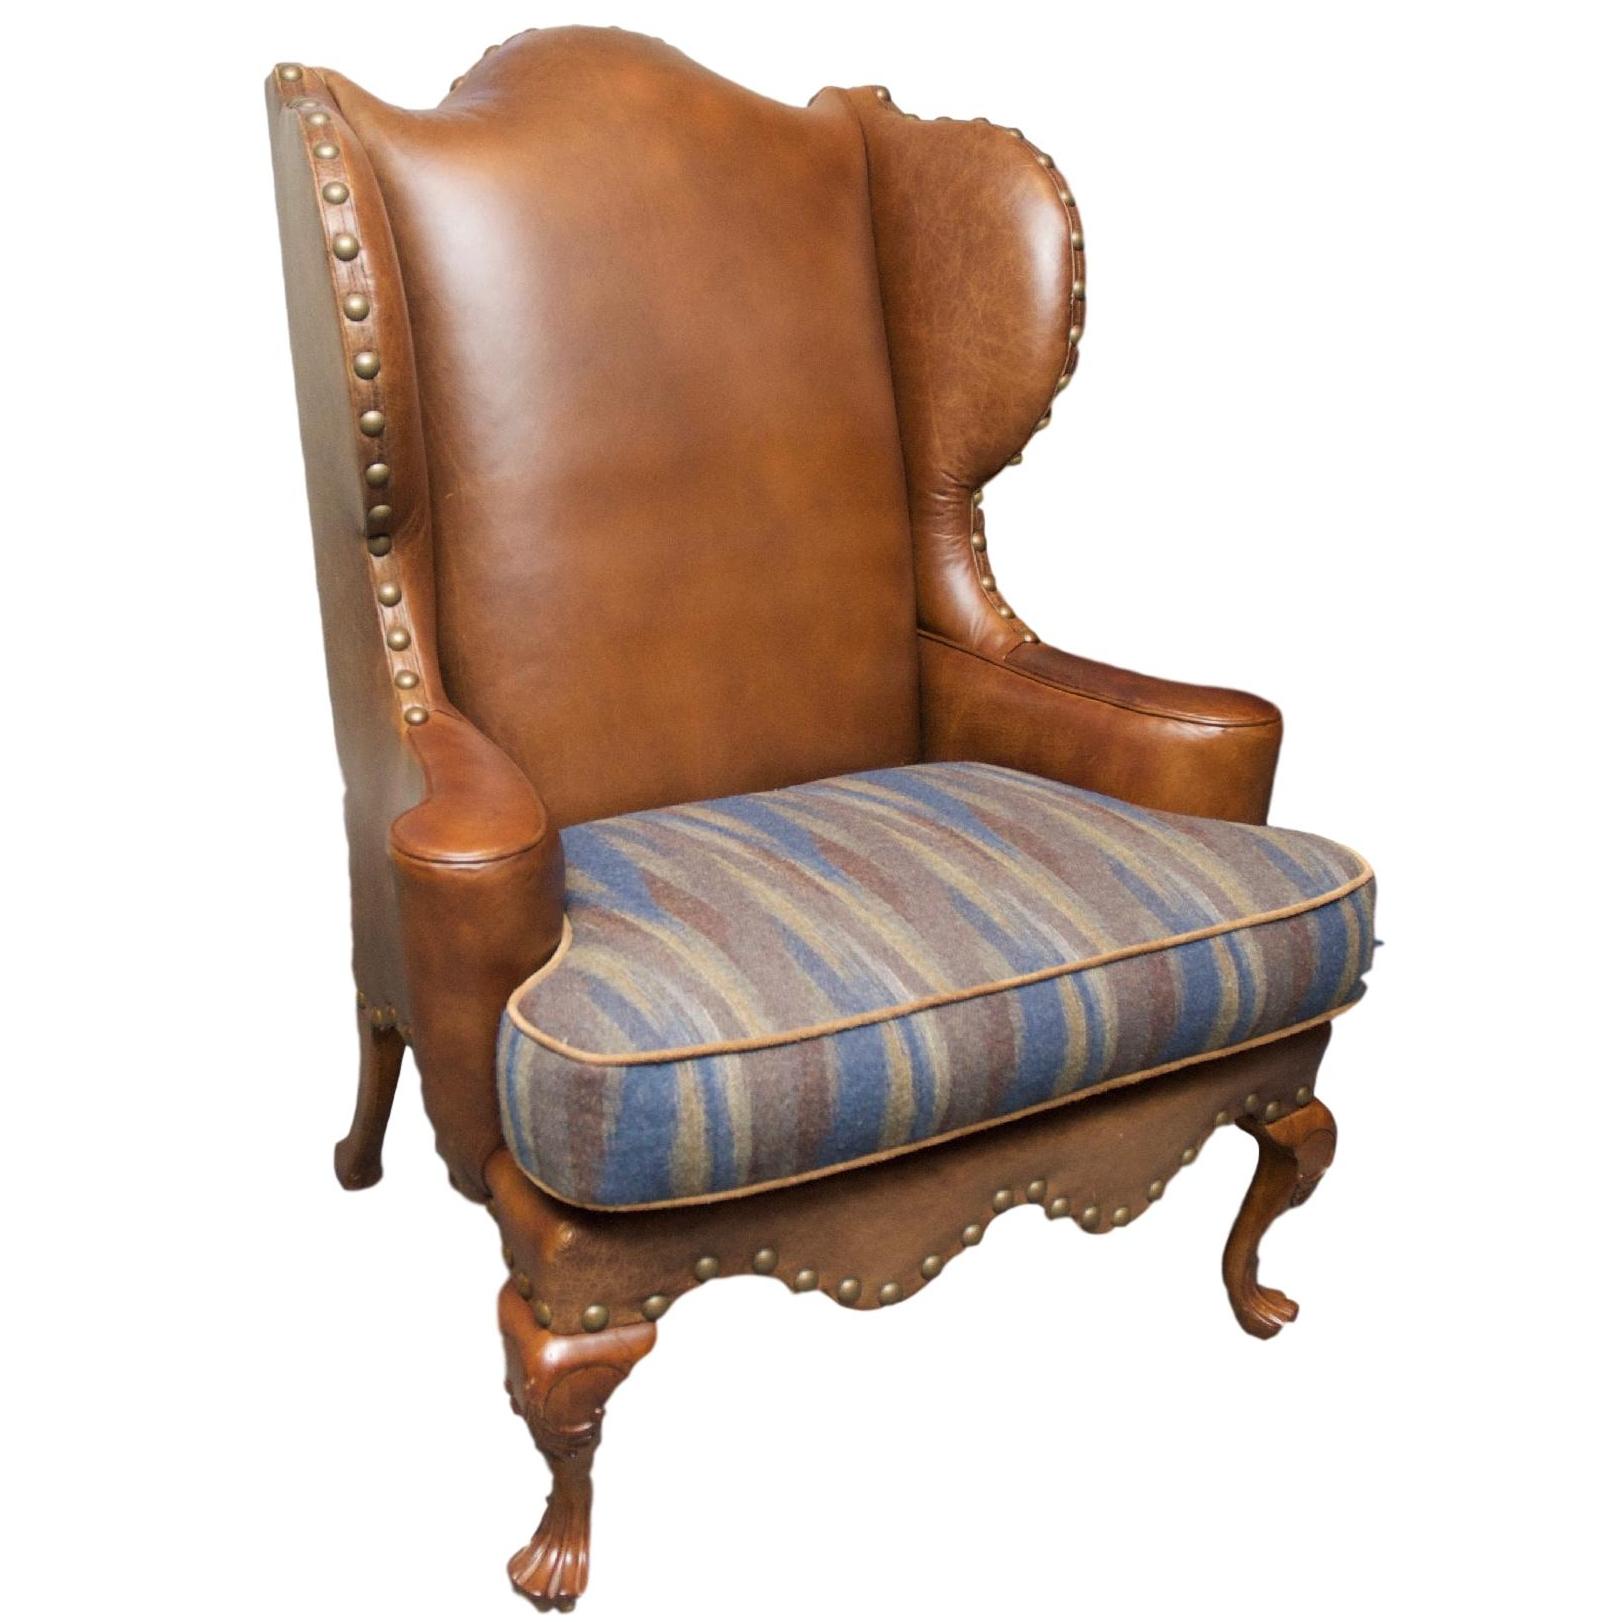 century leather wingback chair w nailhead trim